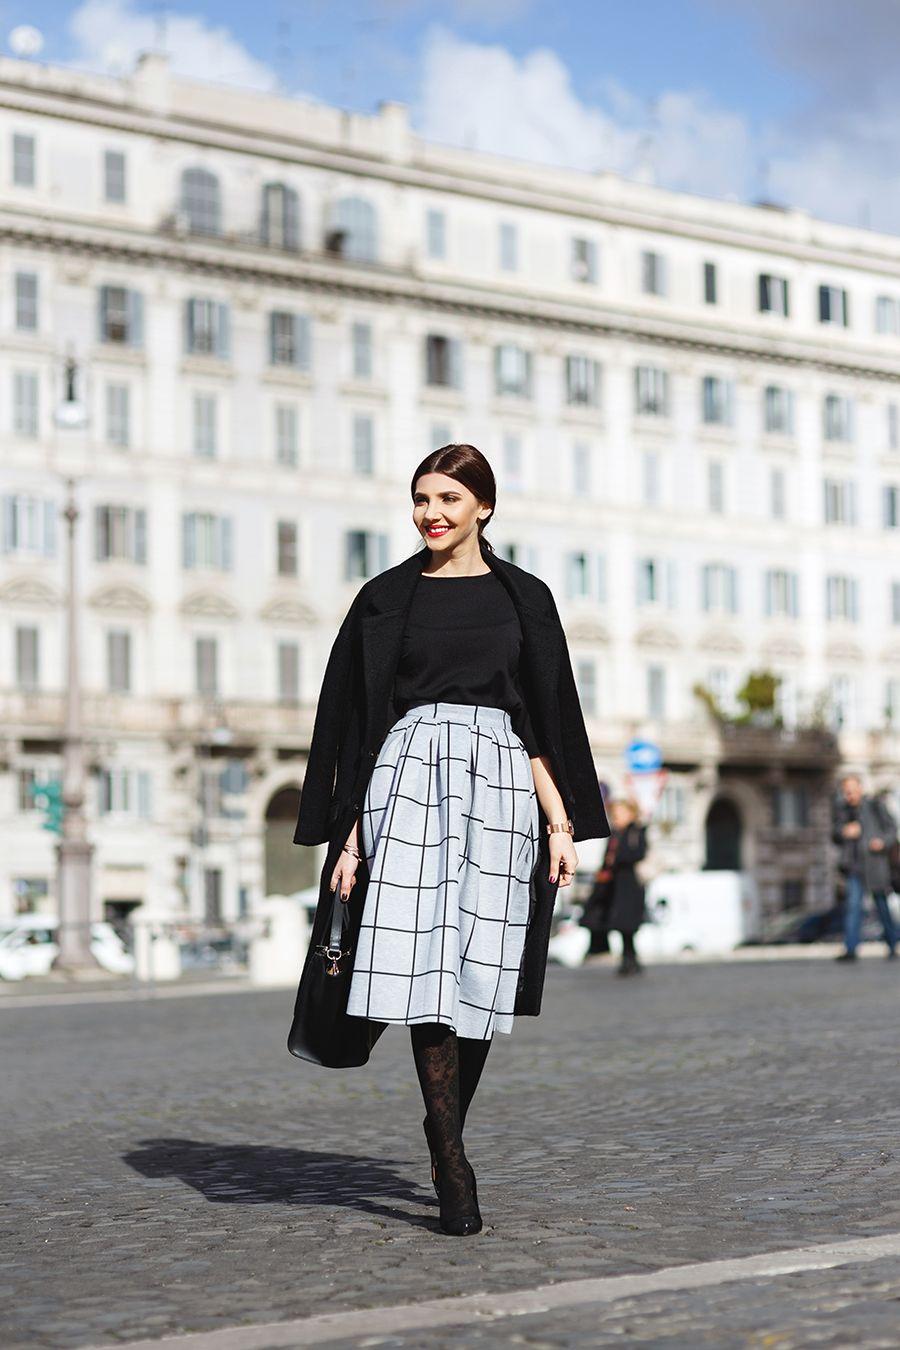 X larisa costea, larisa costea blog, blog de moda , fashion blog, blogger 92e8006068c